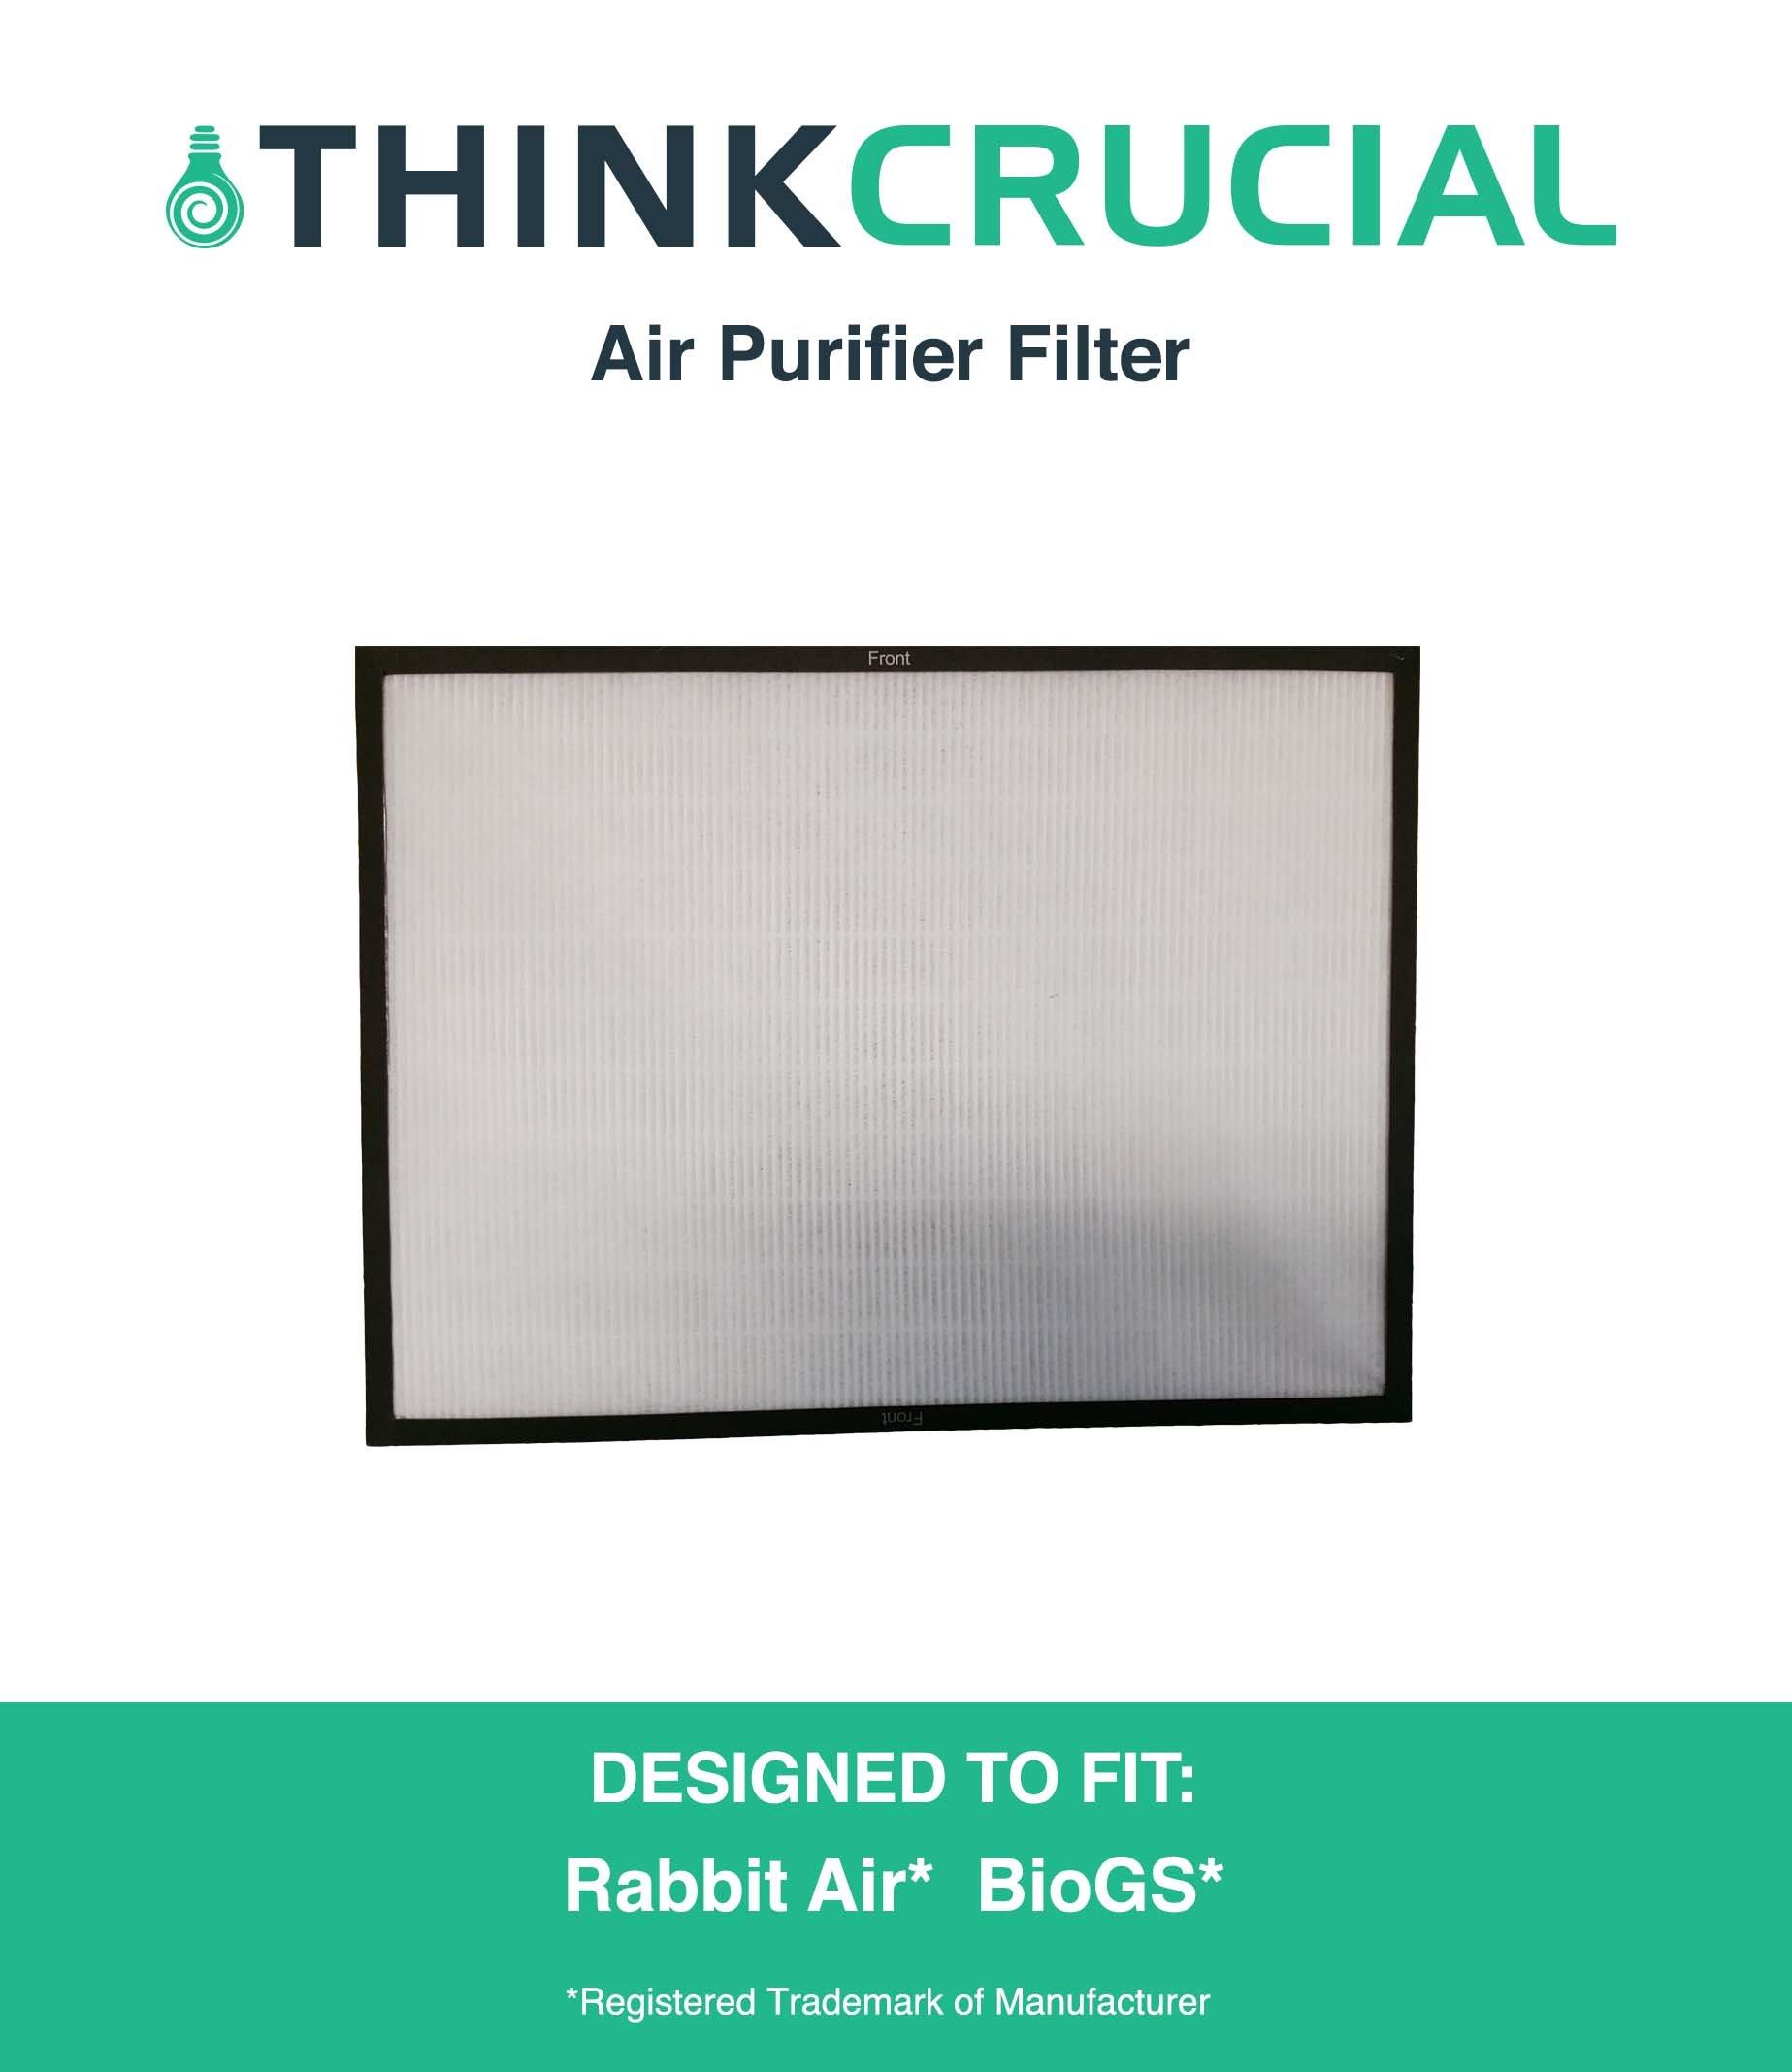 Crucial Air Biogp Air Purifier Filter